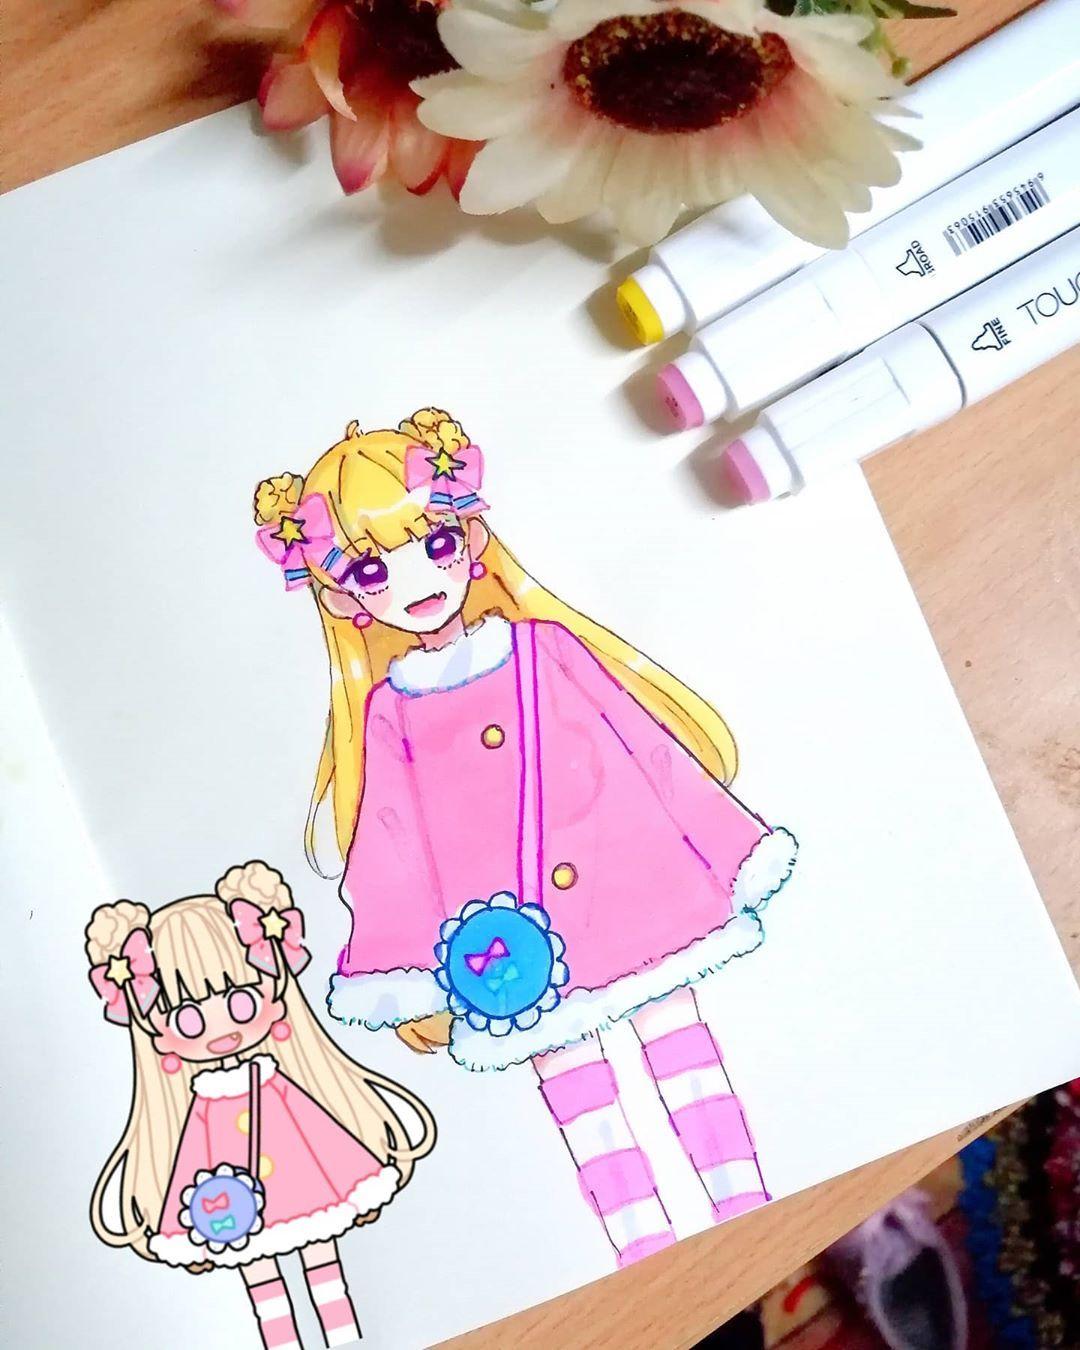 amazing! I love it! #animeart_feature #anime_sketches25 #animegaleryart #animeartist_support_ron #animeartistssquad #anime_arts_help #animebreath #anime_ignite #animeartassistant #animeartgallery #channeldraws #animearttr #anime_artist_dr #animegaleryart #artfeatbytom